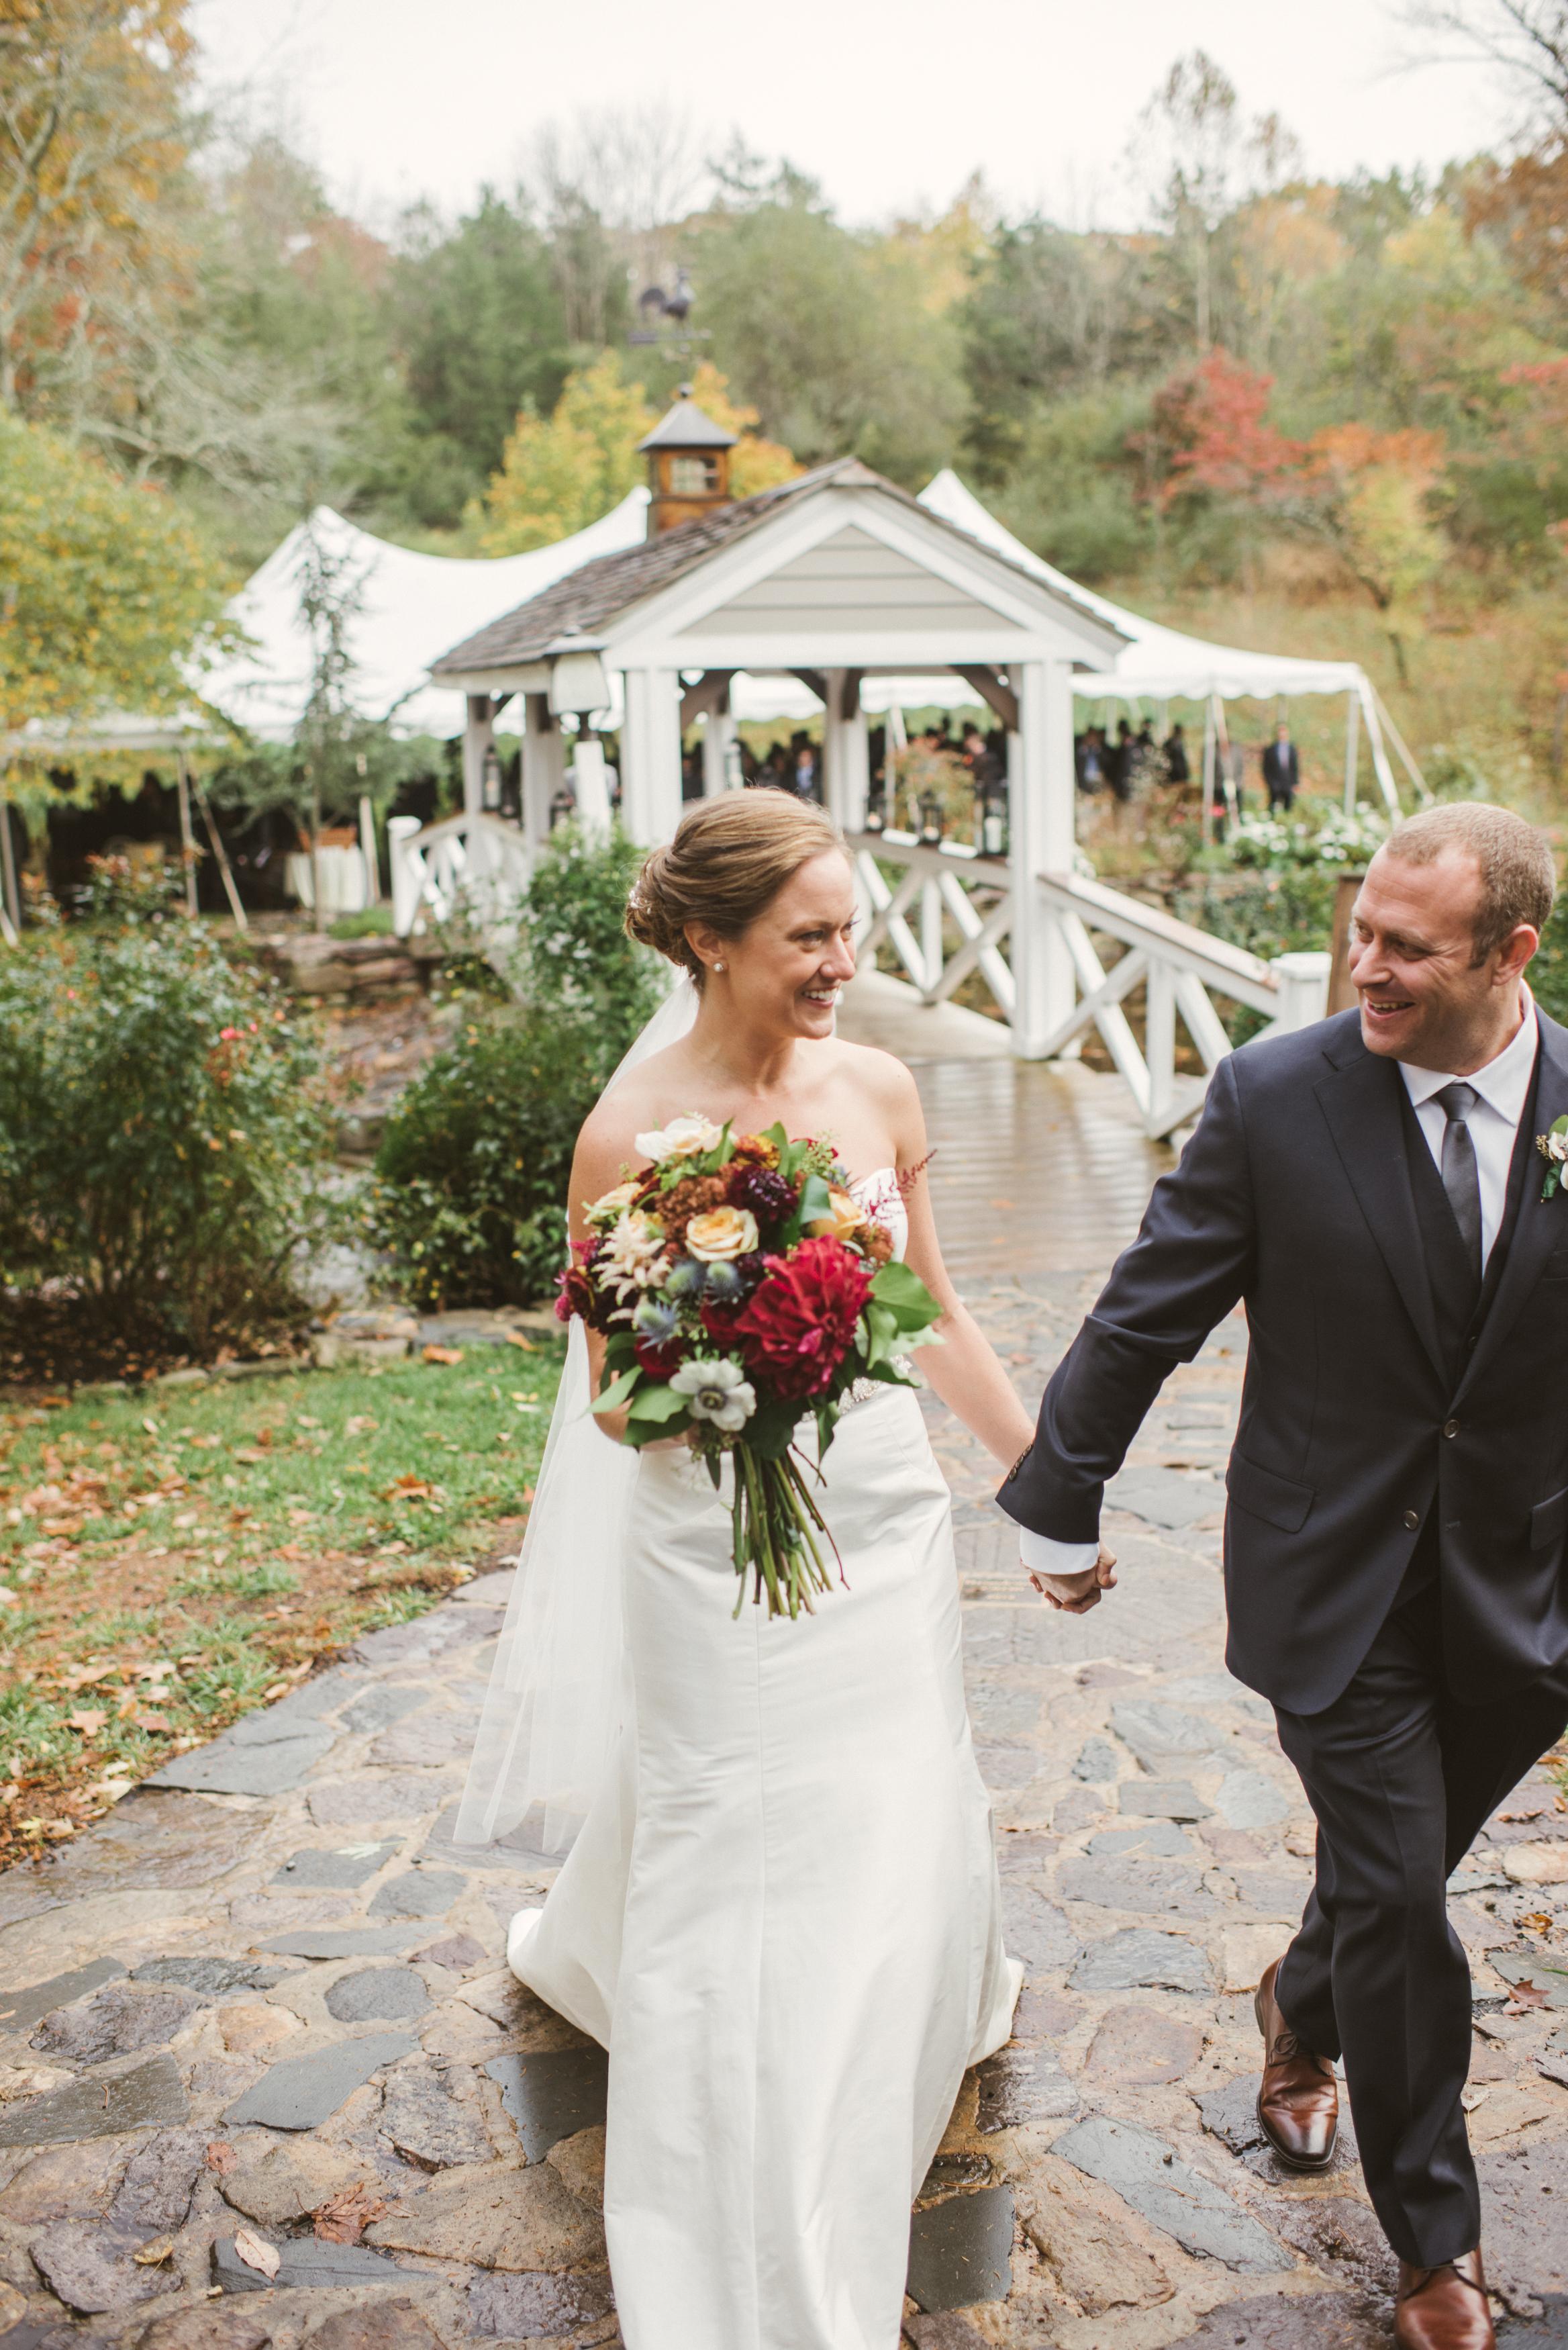 JACQUELINE & ANDREW WARSHAWER -BROOKMILL FARM FALL WEDDING - INTIMATE WEDDING PHOTOGRAPHER - TWOTWENTY by CHI-CHI AGBIM-288.jpg